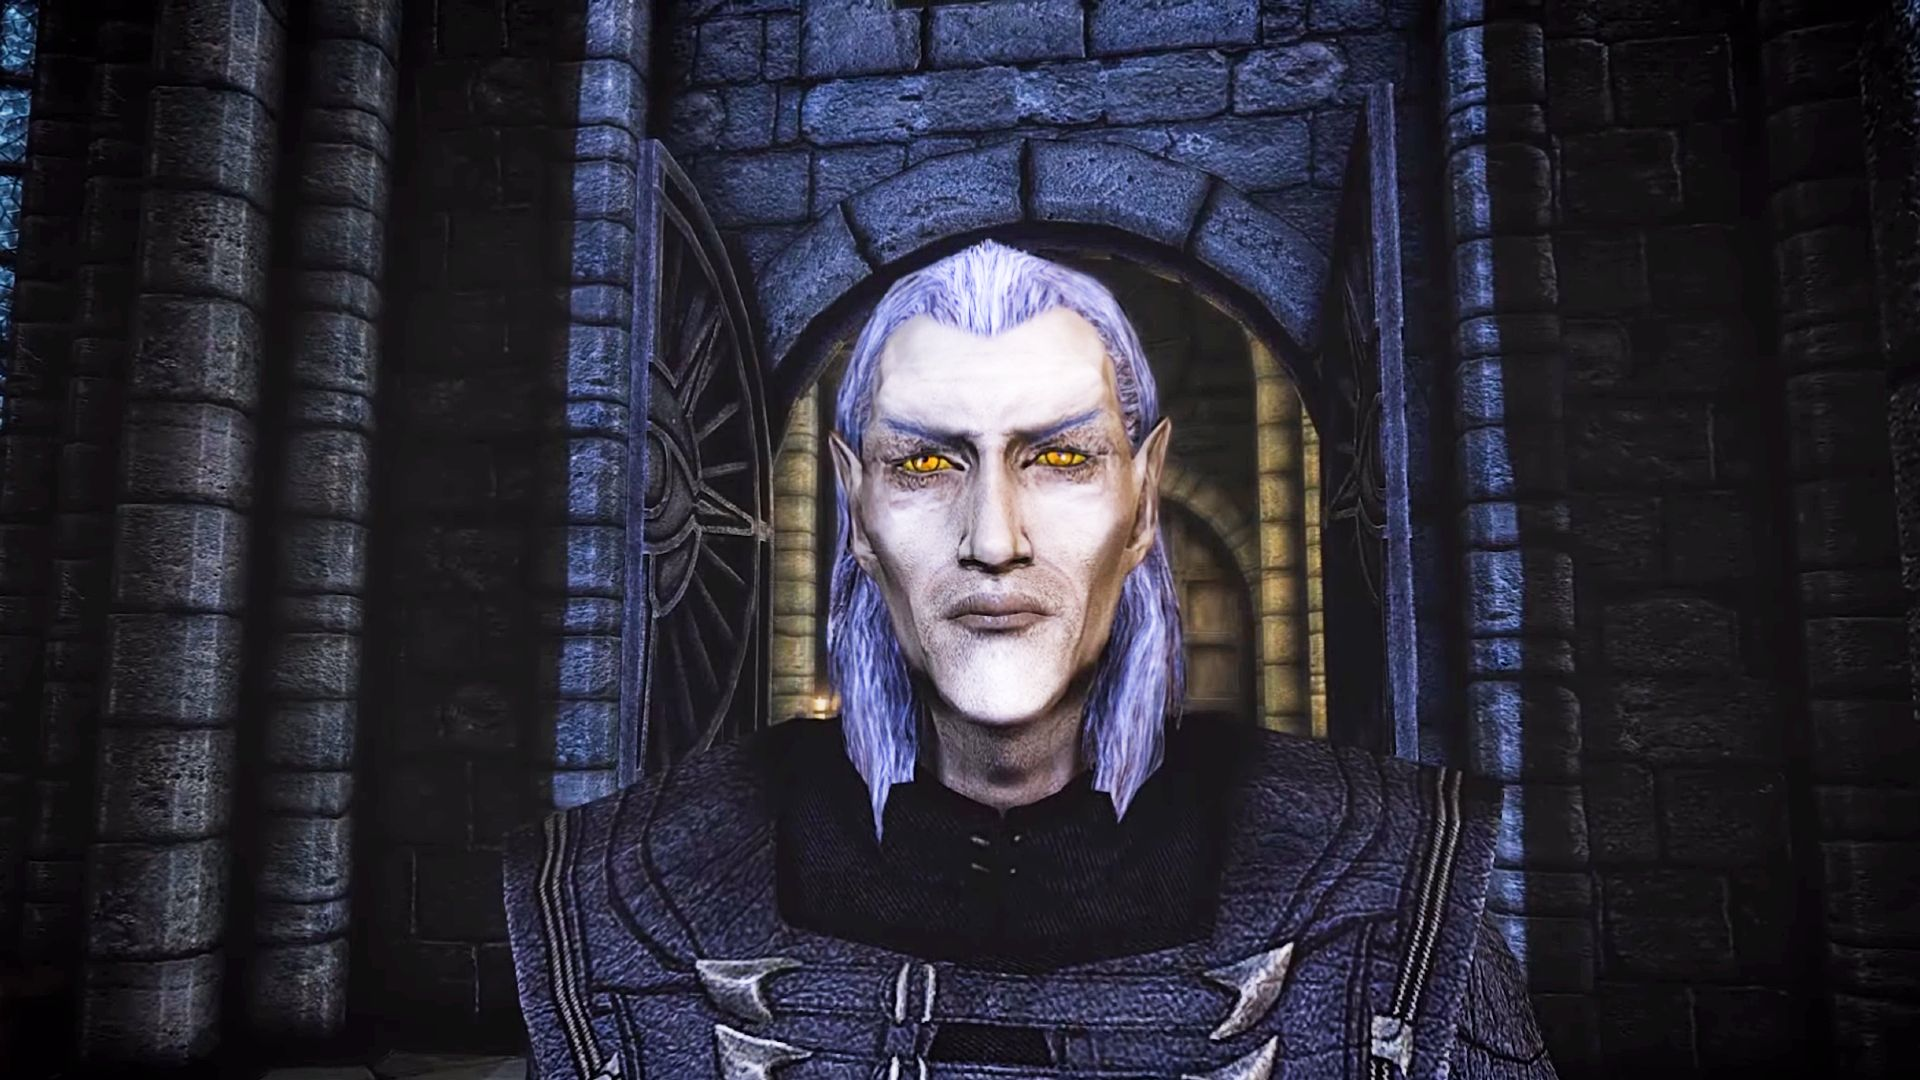 Weird Skyrim lore: the Thalmor's crimes against hu-meownanity